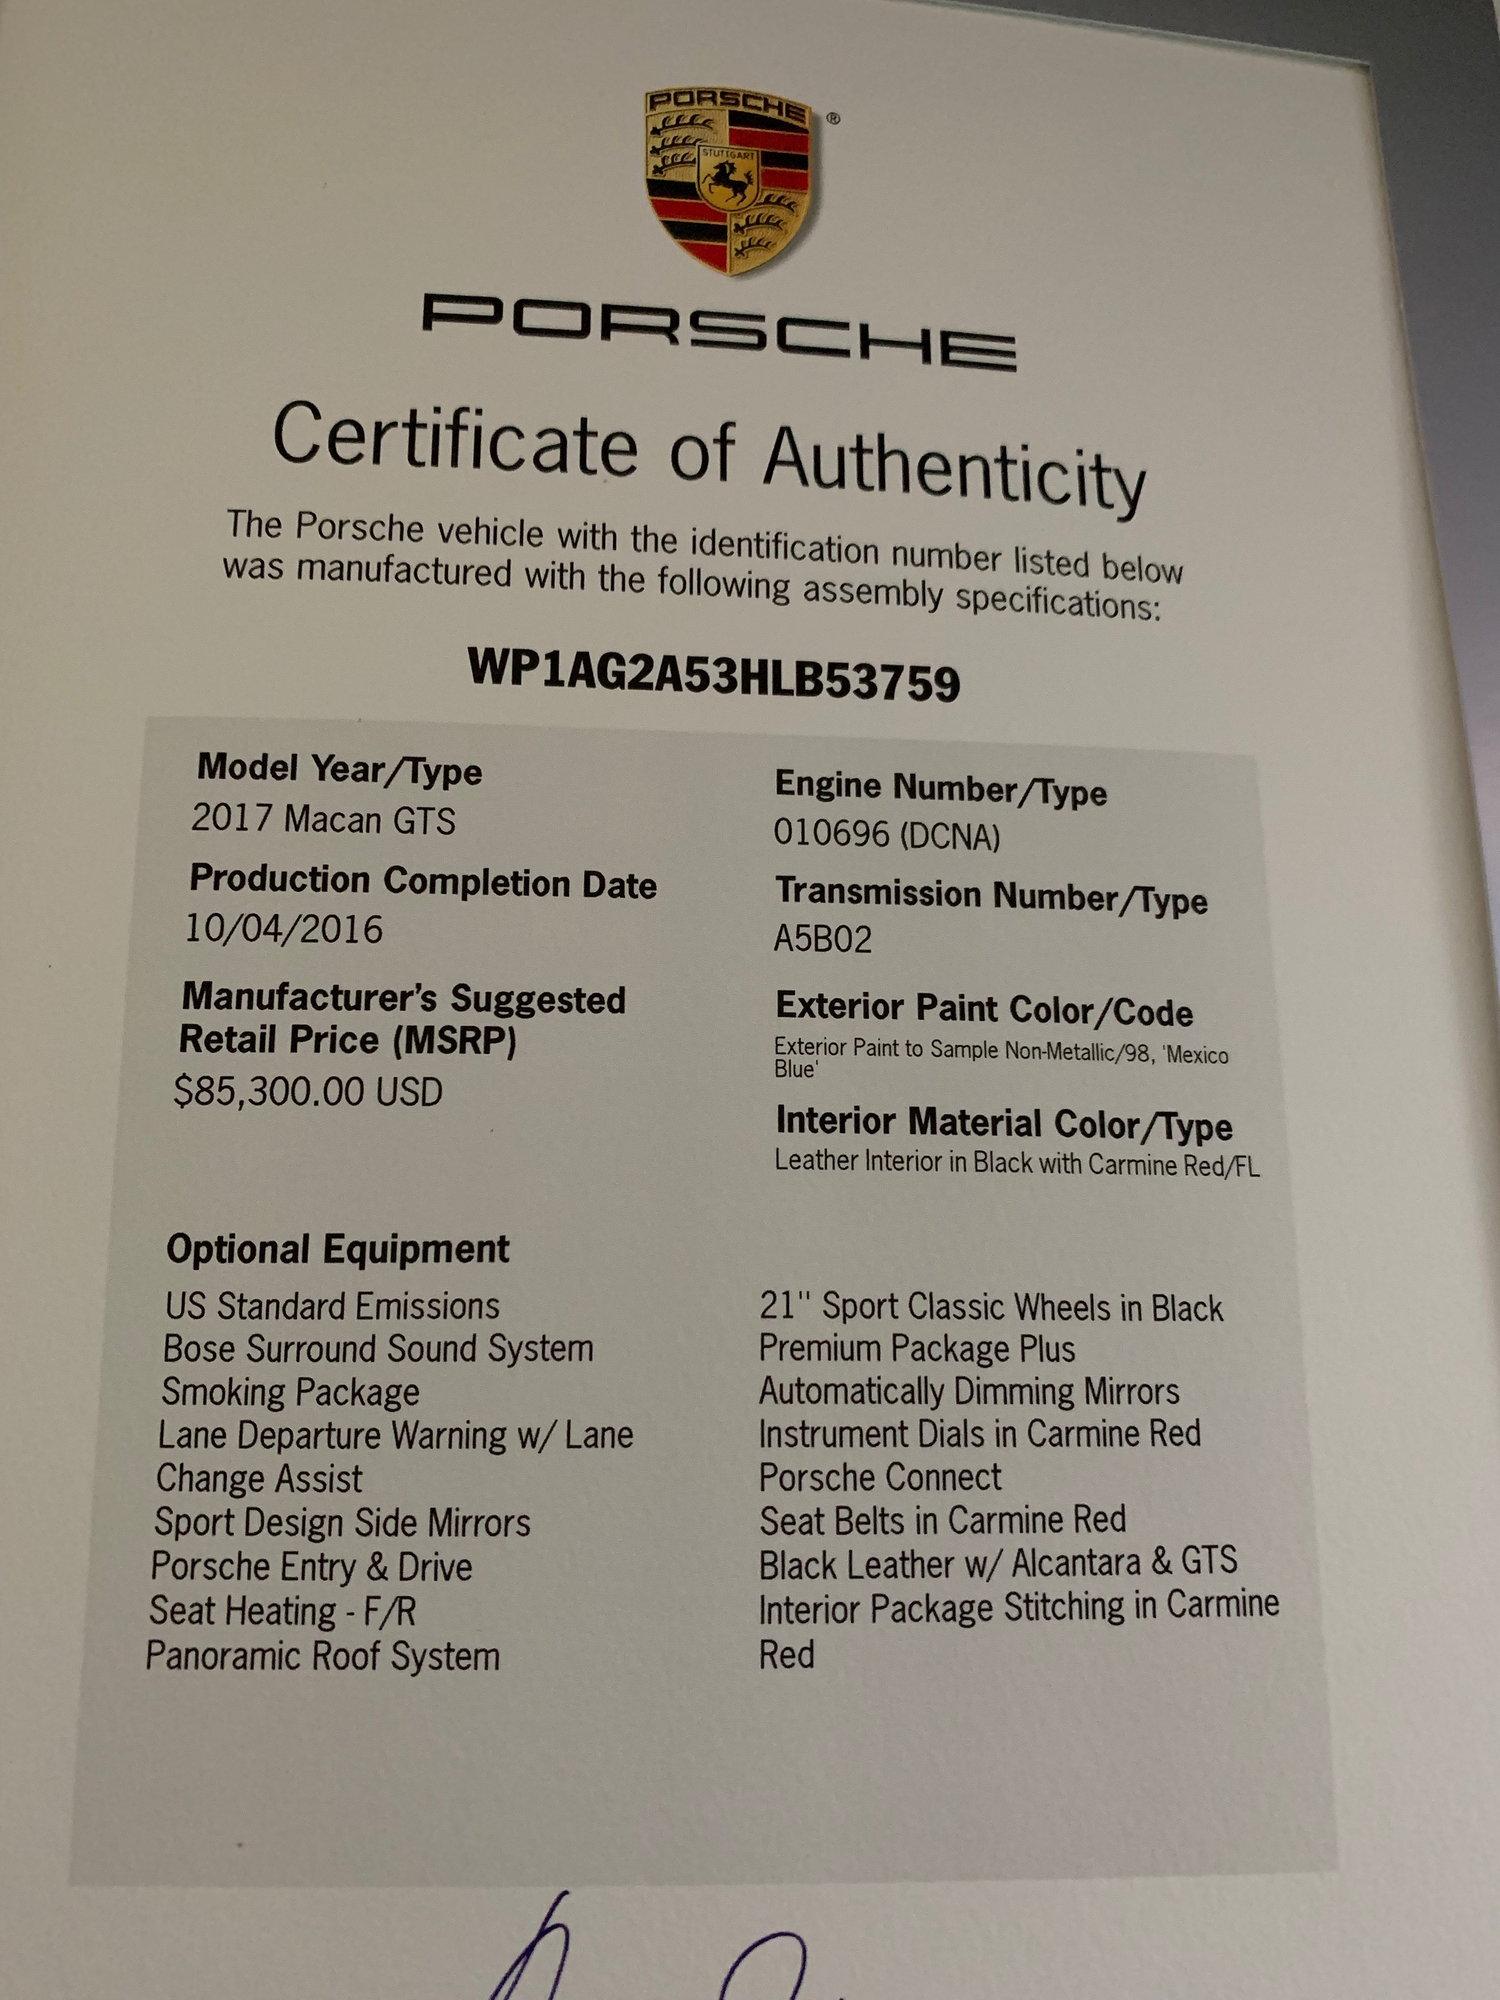 Porsche Macan GTS PTS Mexico Blue Exceptional - Rennlist - Porsche